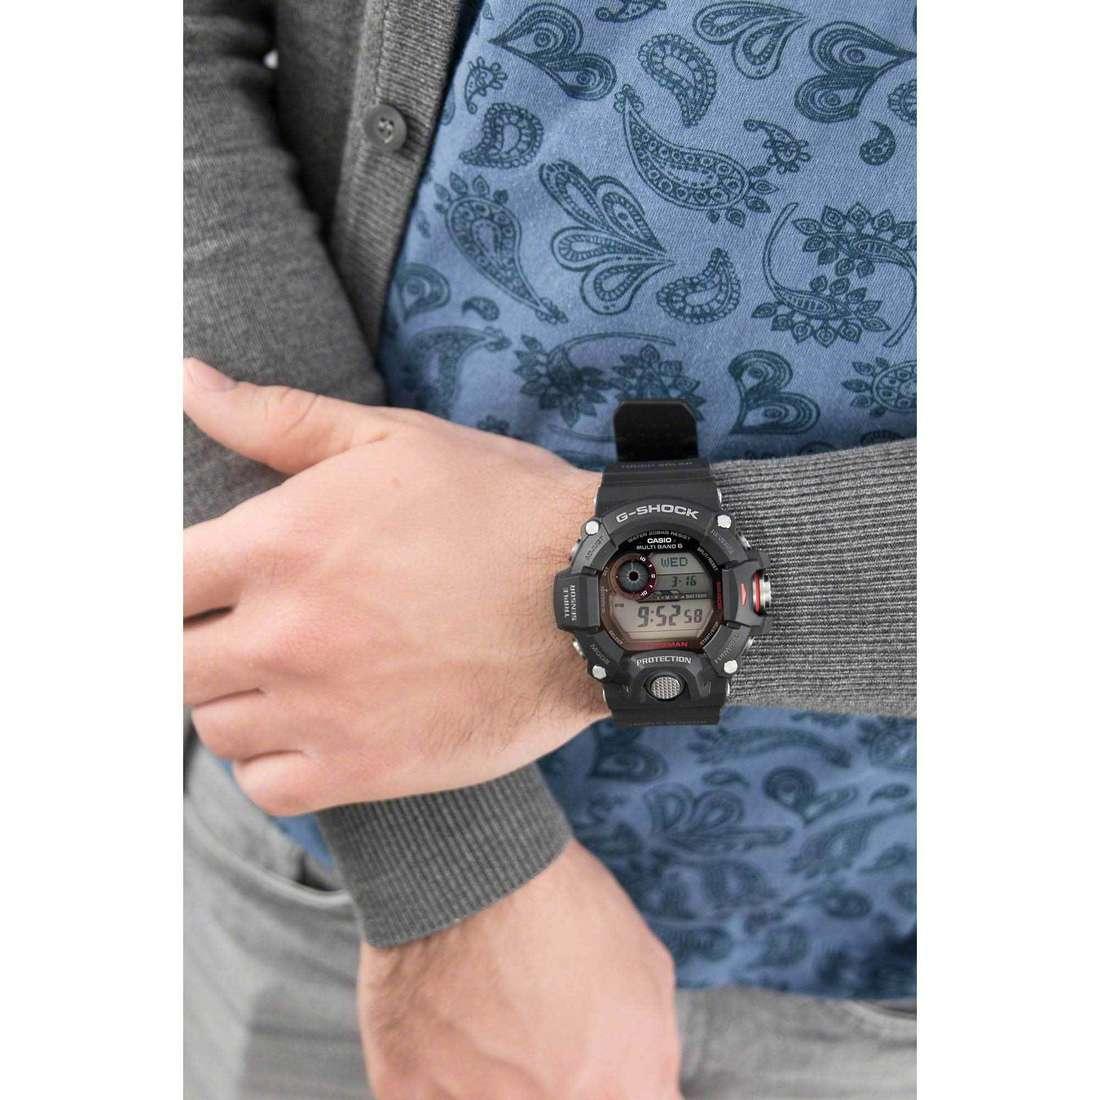 Casio digitali G-Shock uomo GW-9400-1ER indosso